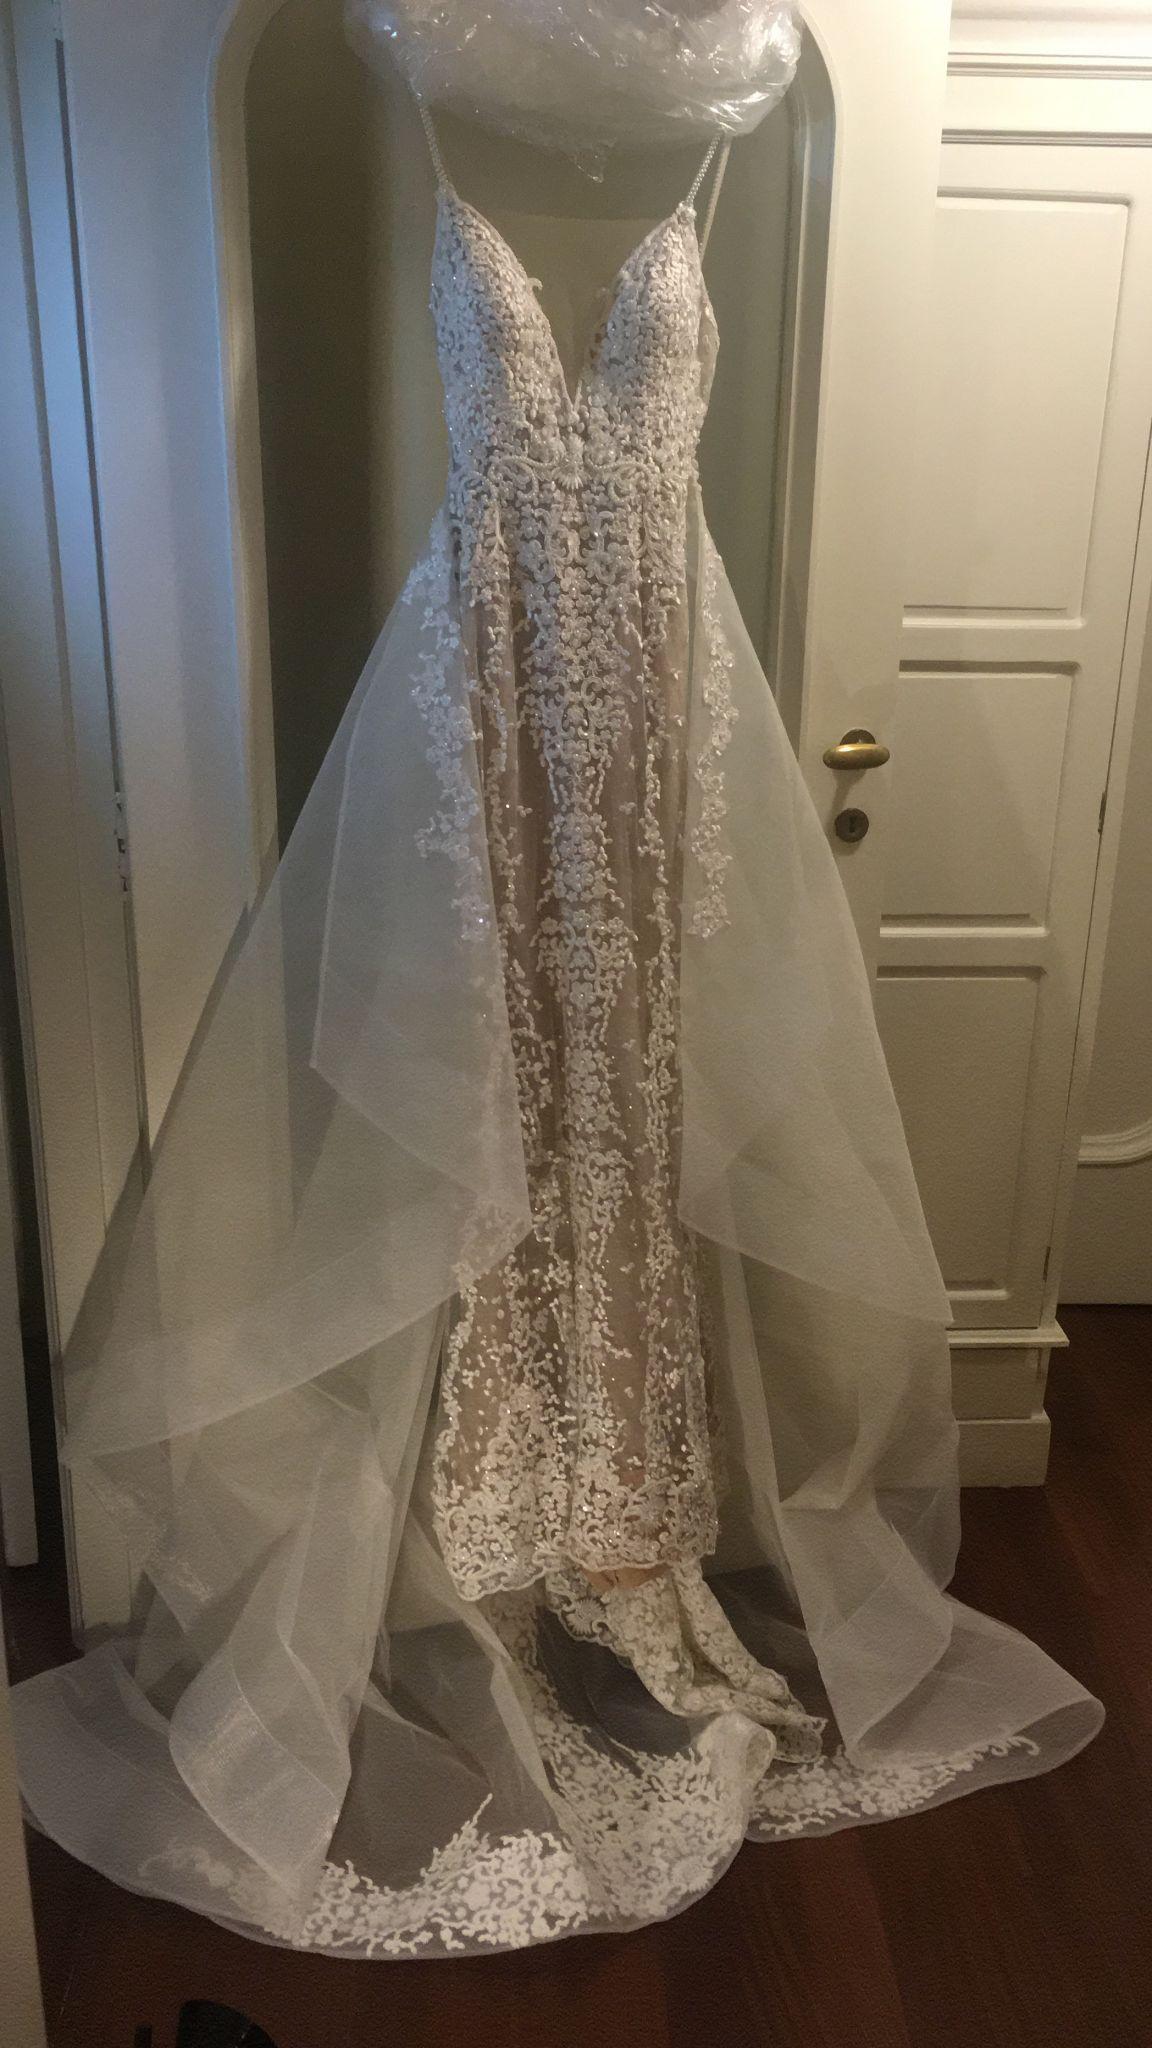 Berta 20 20 Wedding Dress   Used, Size 20, €20,20   Dresses ...